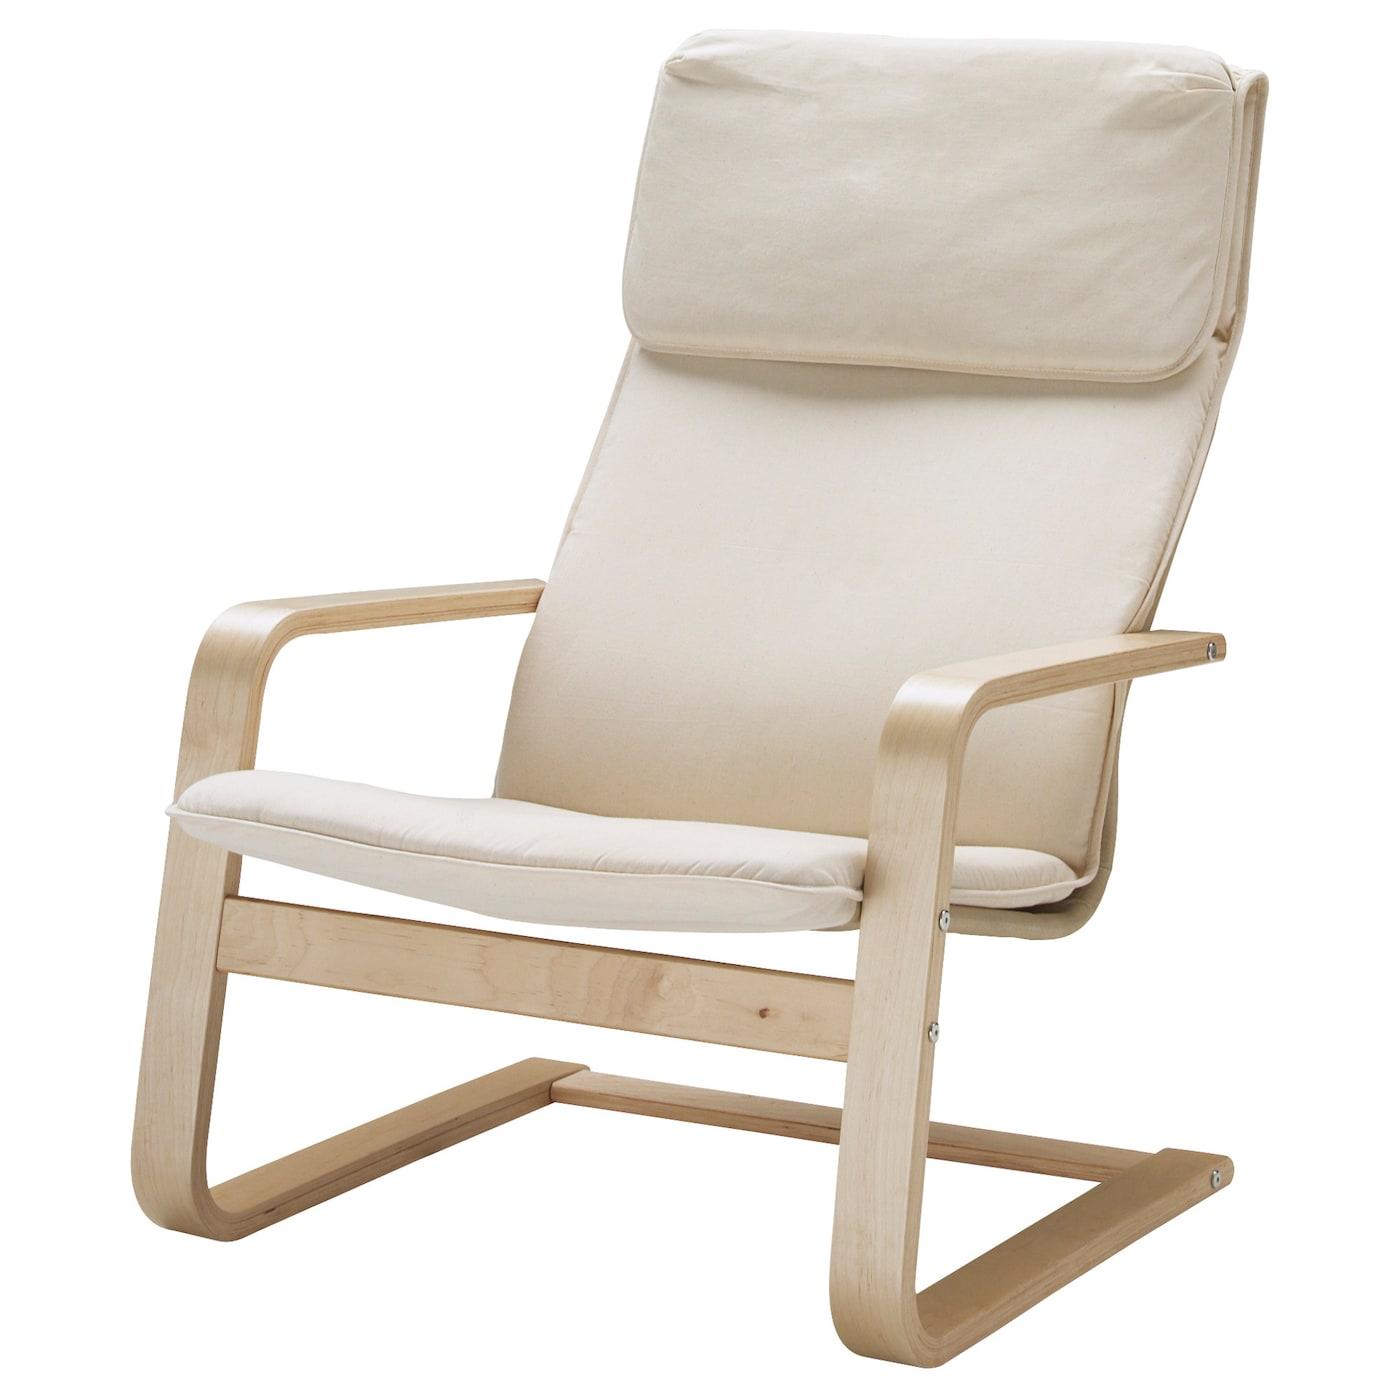 IKEA Armless Chair Chairs for sale | eBay